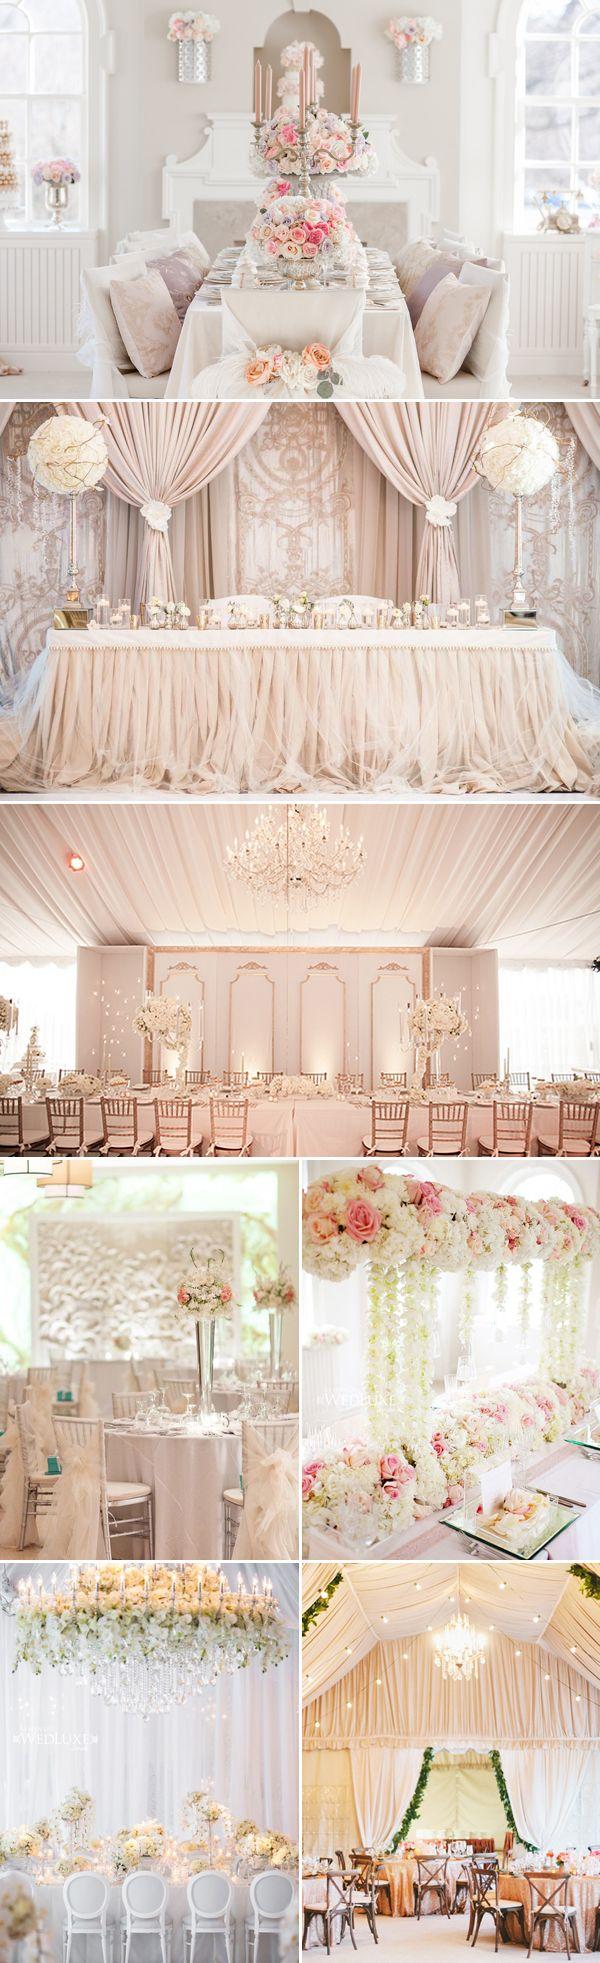 Wedding reception decoration ideas   Stunning Luxury Indoor Reception Decoration Ideas You donut Want